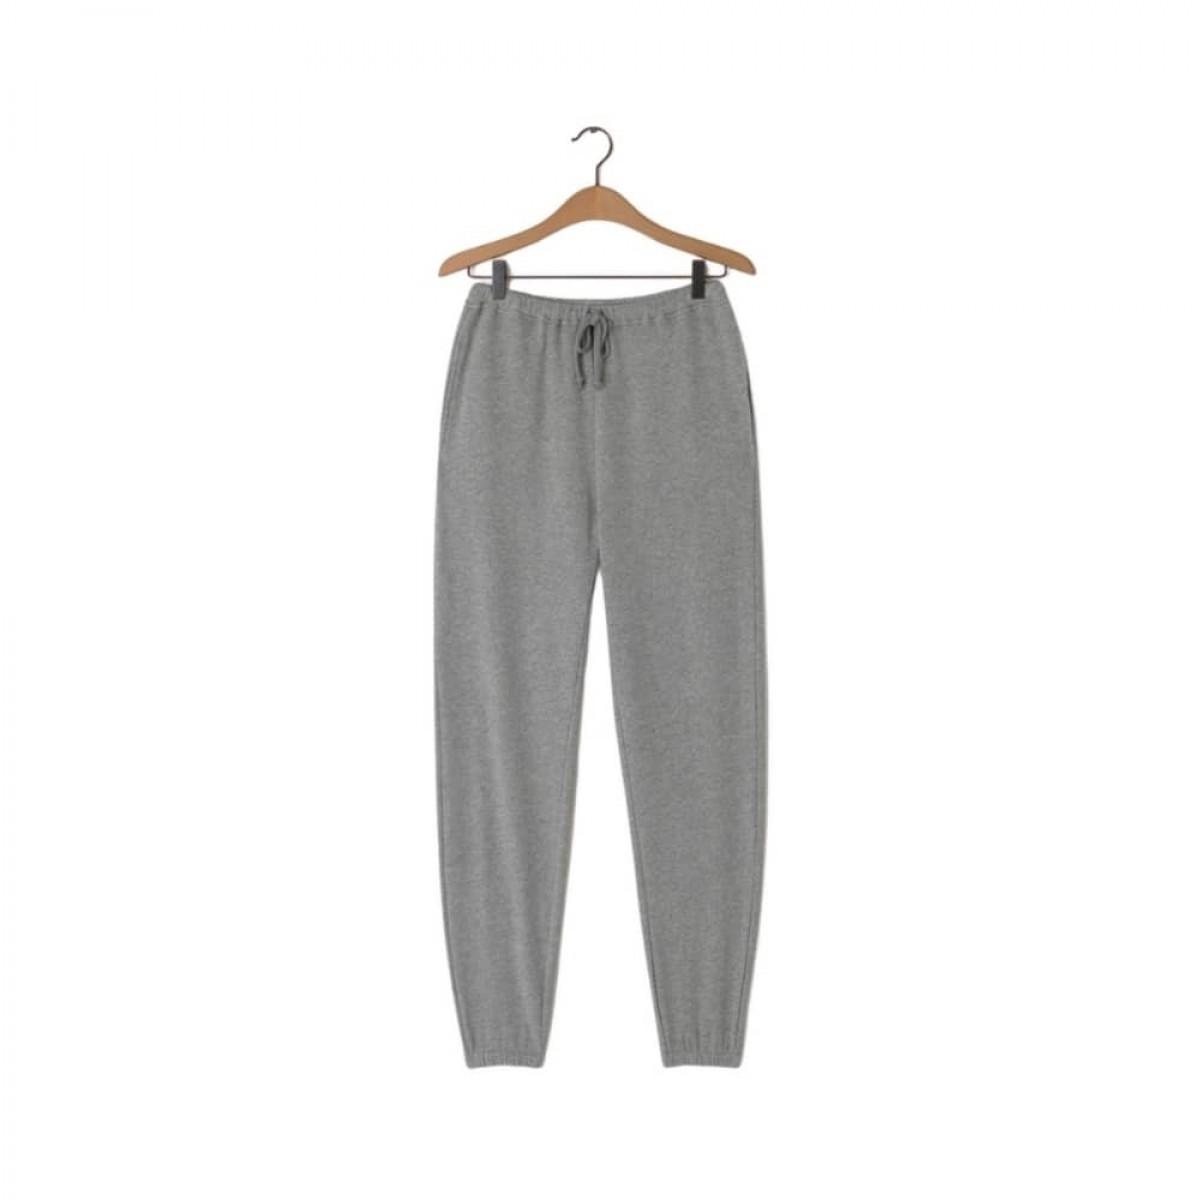 neaford sweat buks - heather grey